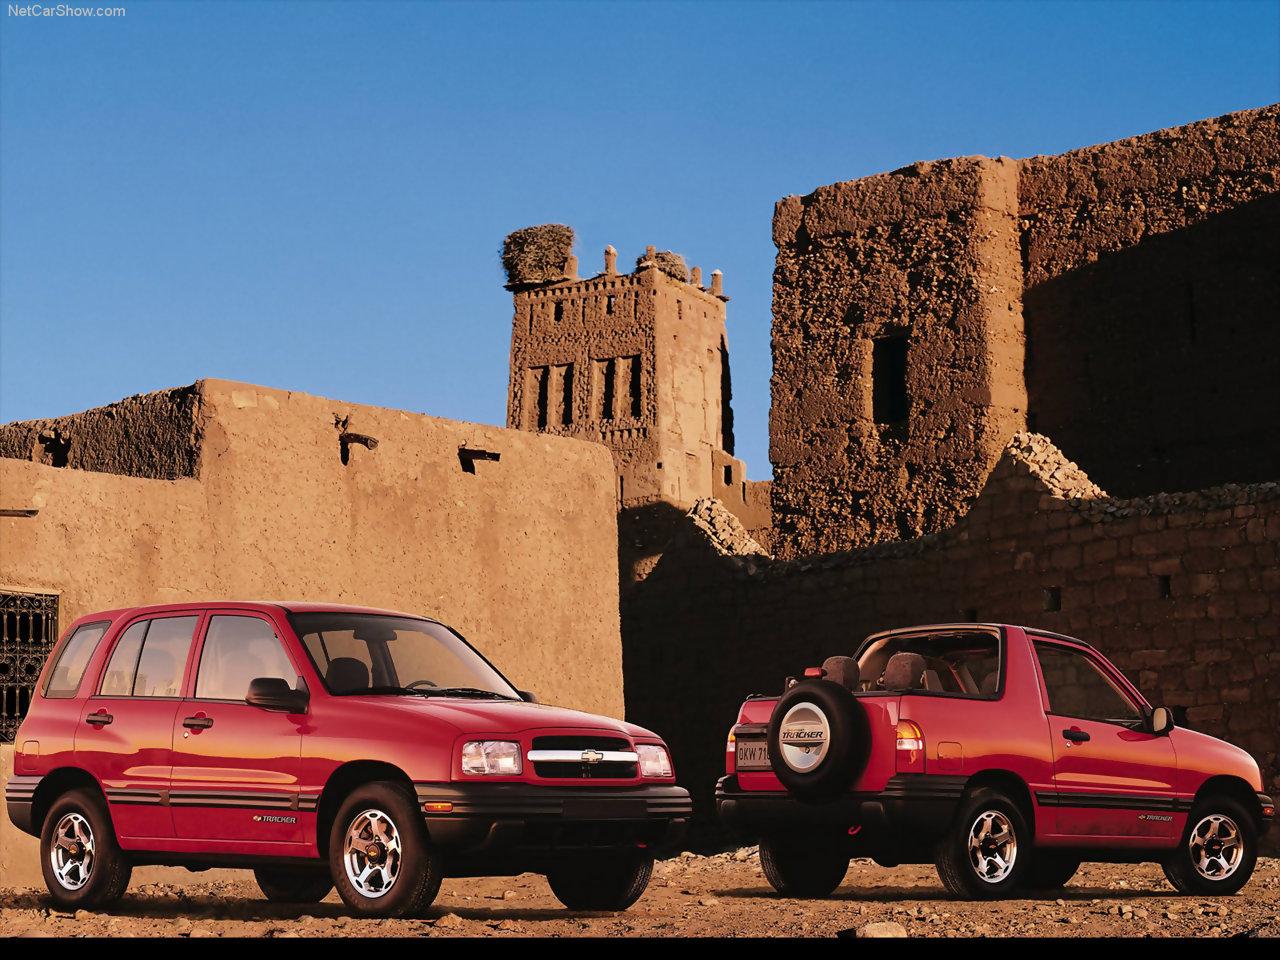 Chevrolet - Populaire français d'automobiles: 2001 Chevrolet Tracker